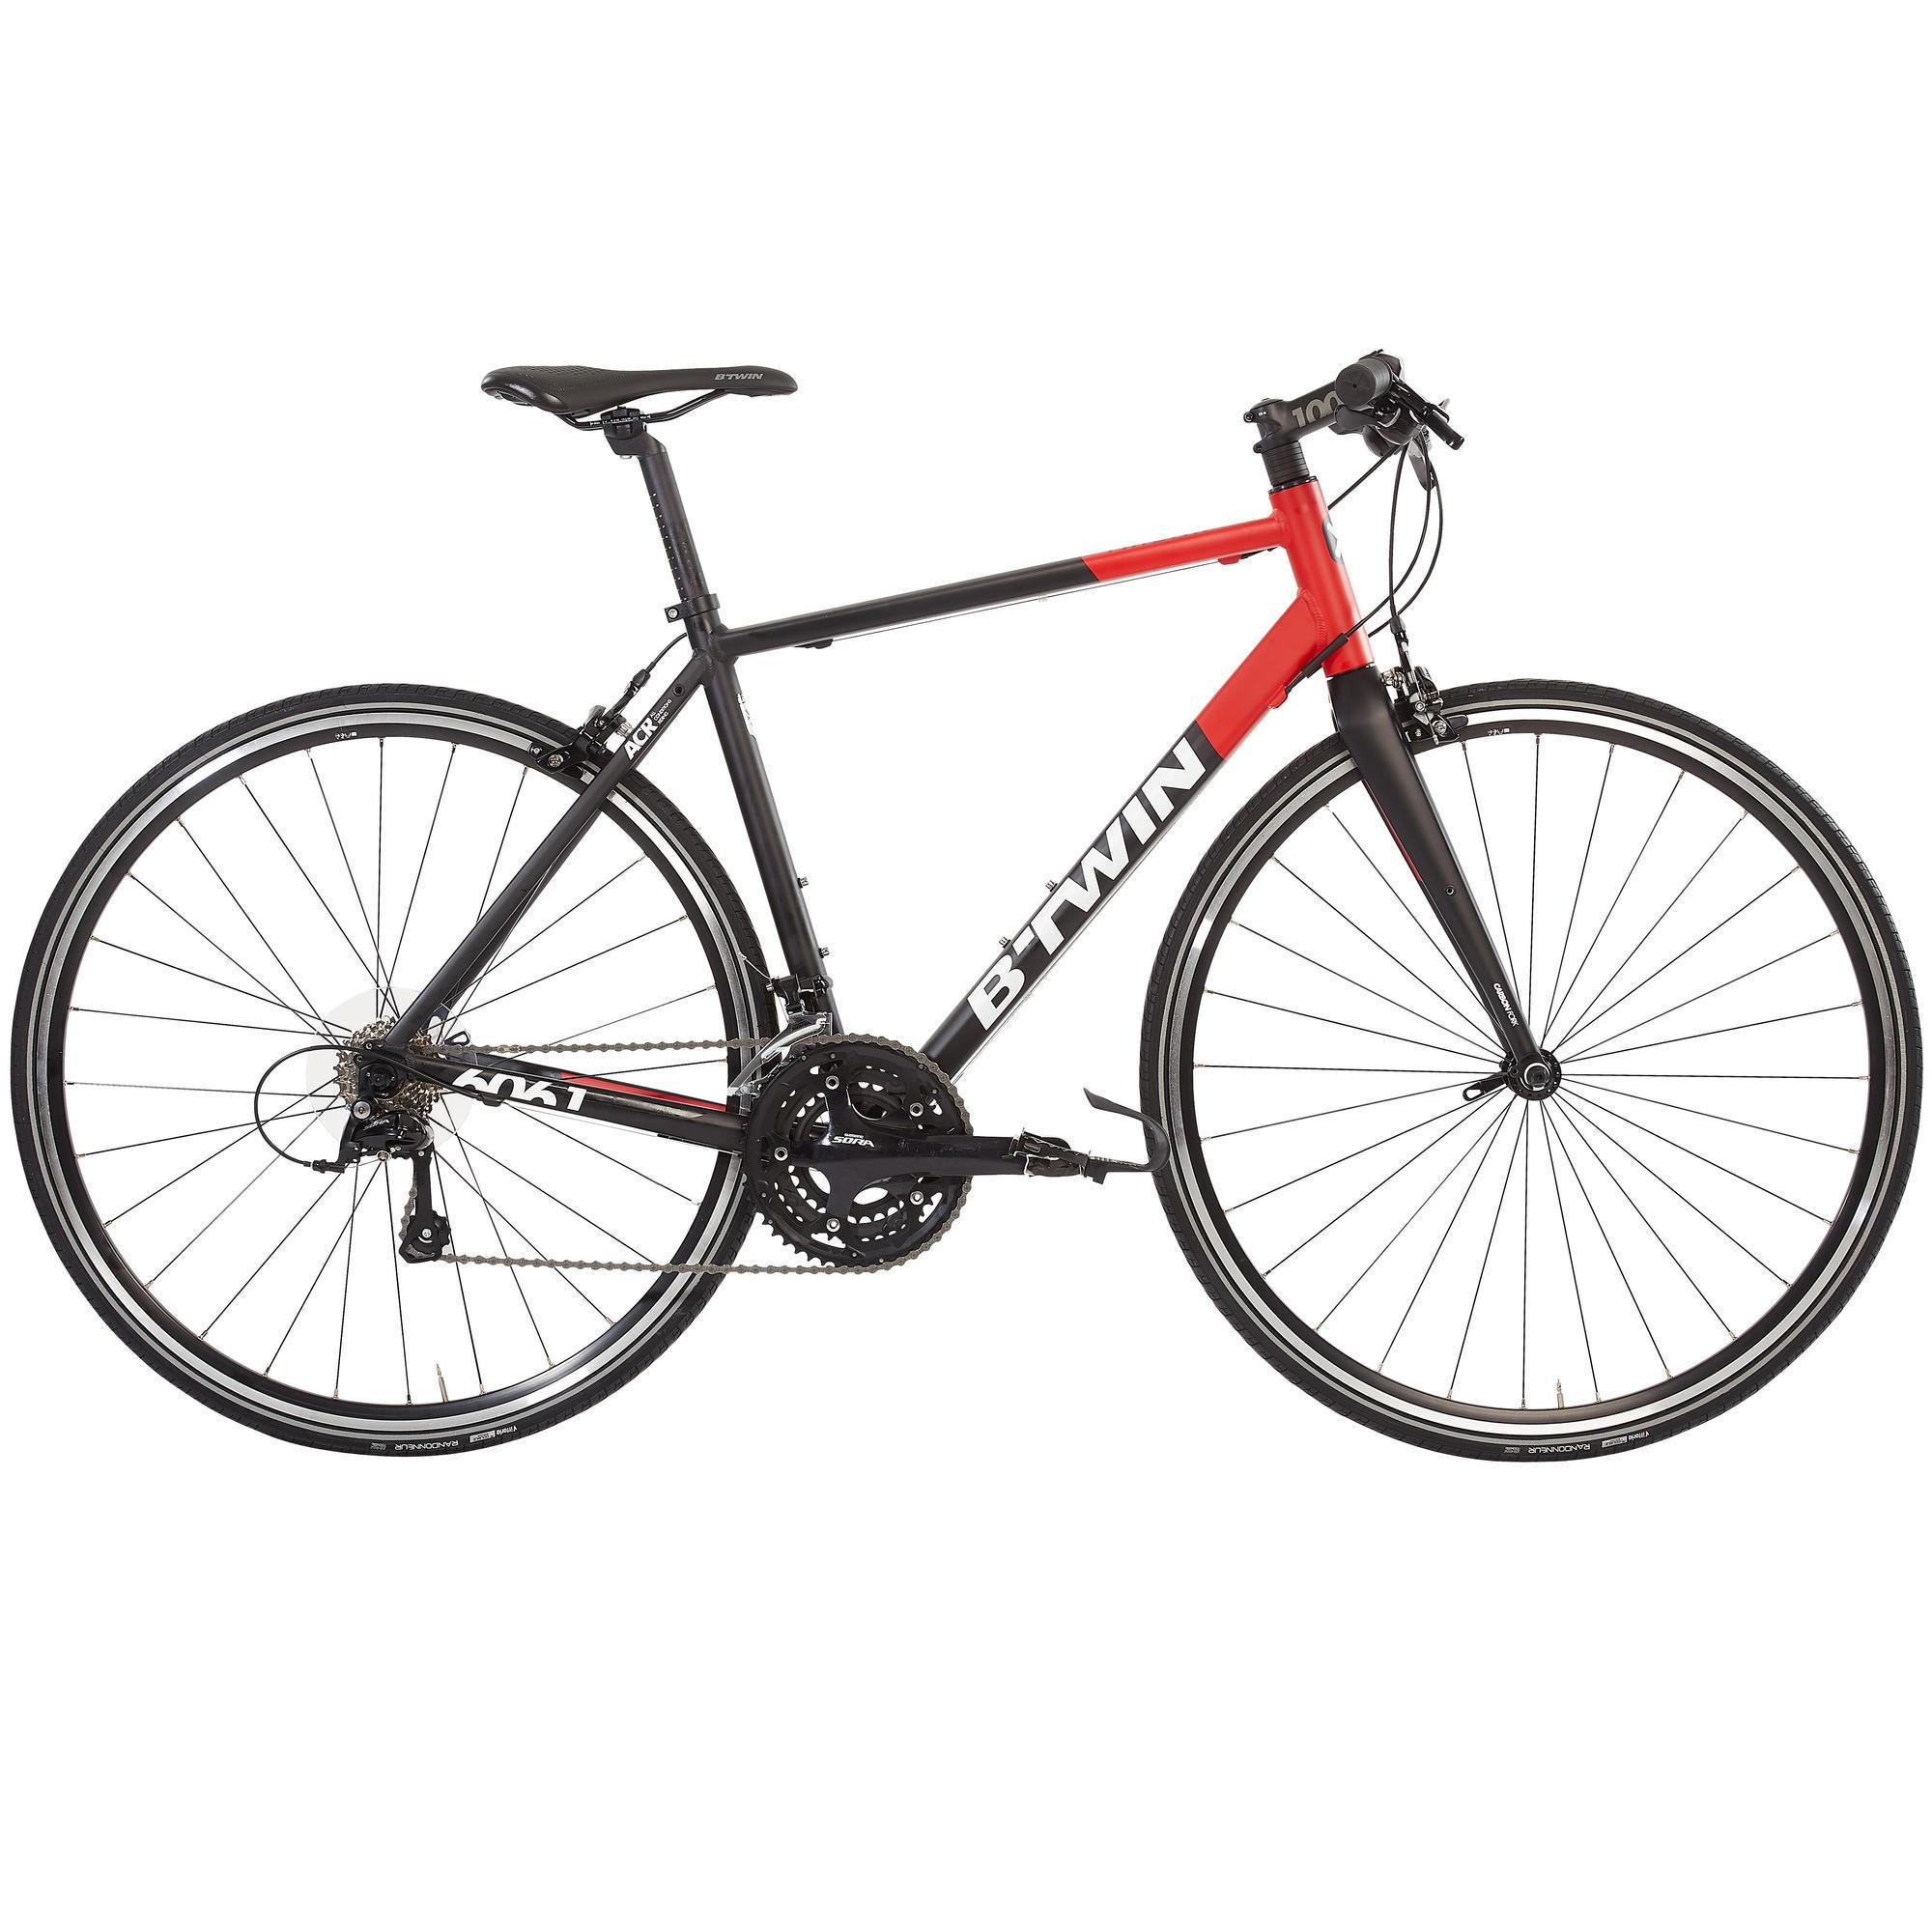 Racefiets Triban 520 FB zwart-rood-wit